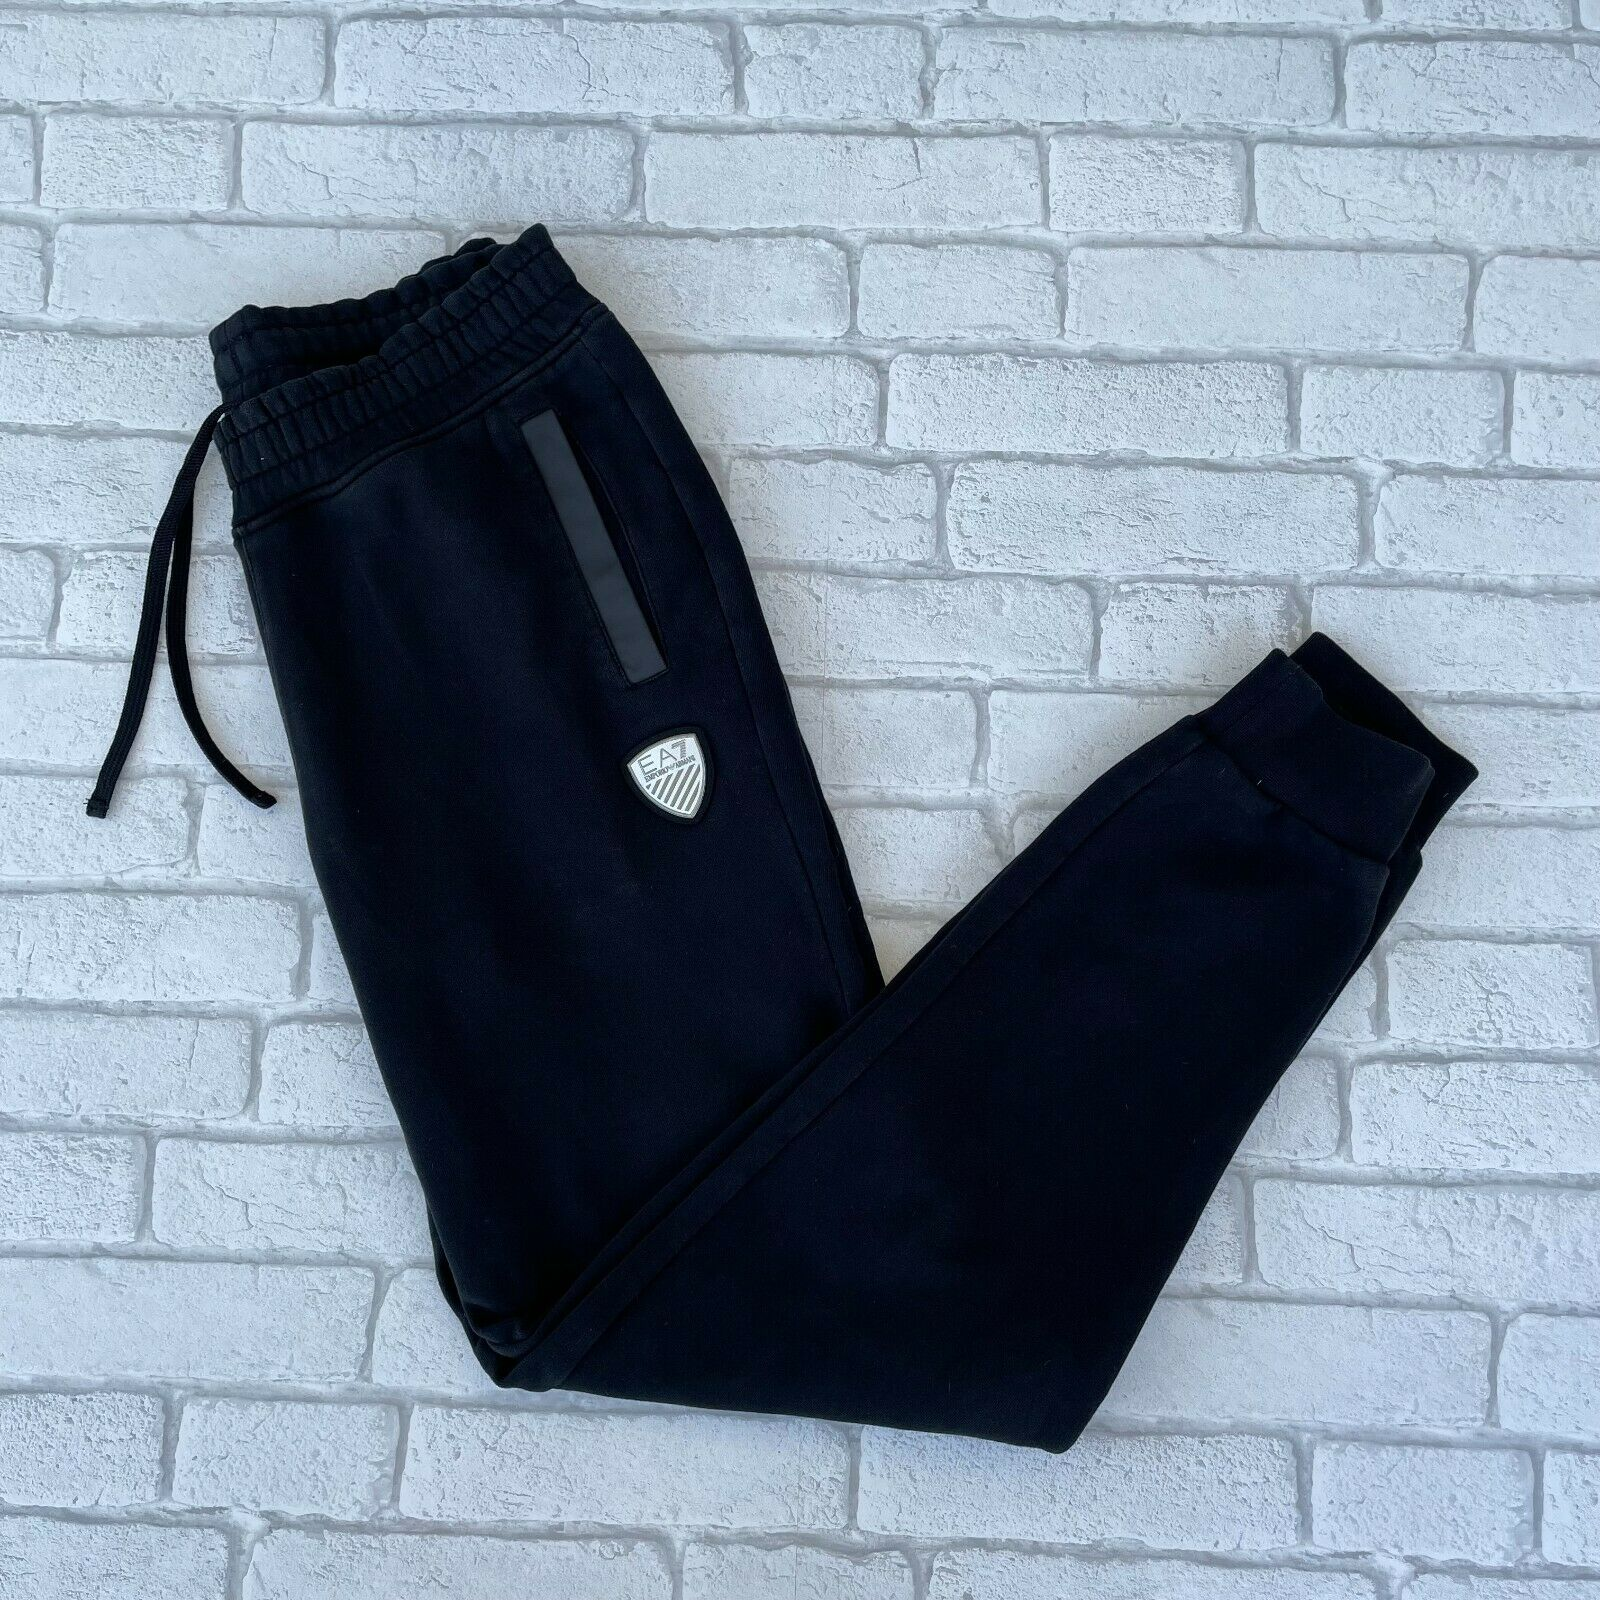 Armani Mens Sports Sweat Pants - Small S - Black - Tracksuit Bottoms Joggers